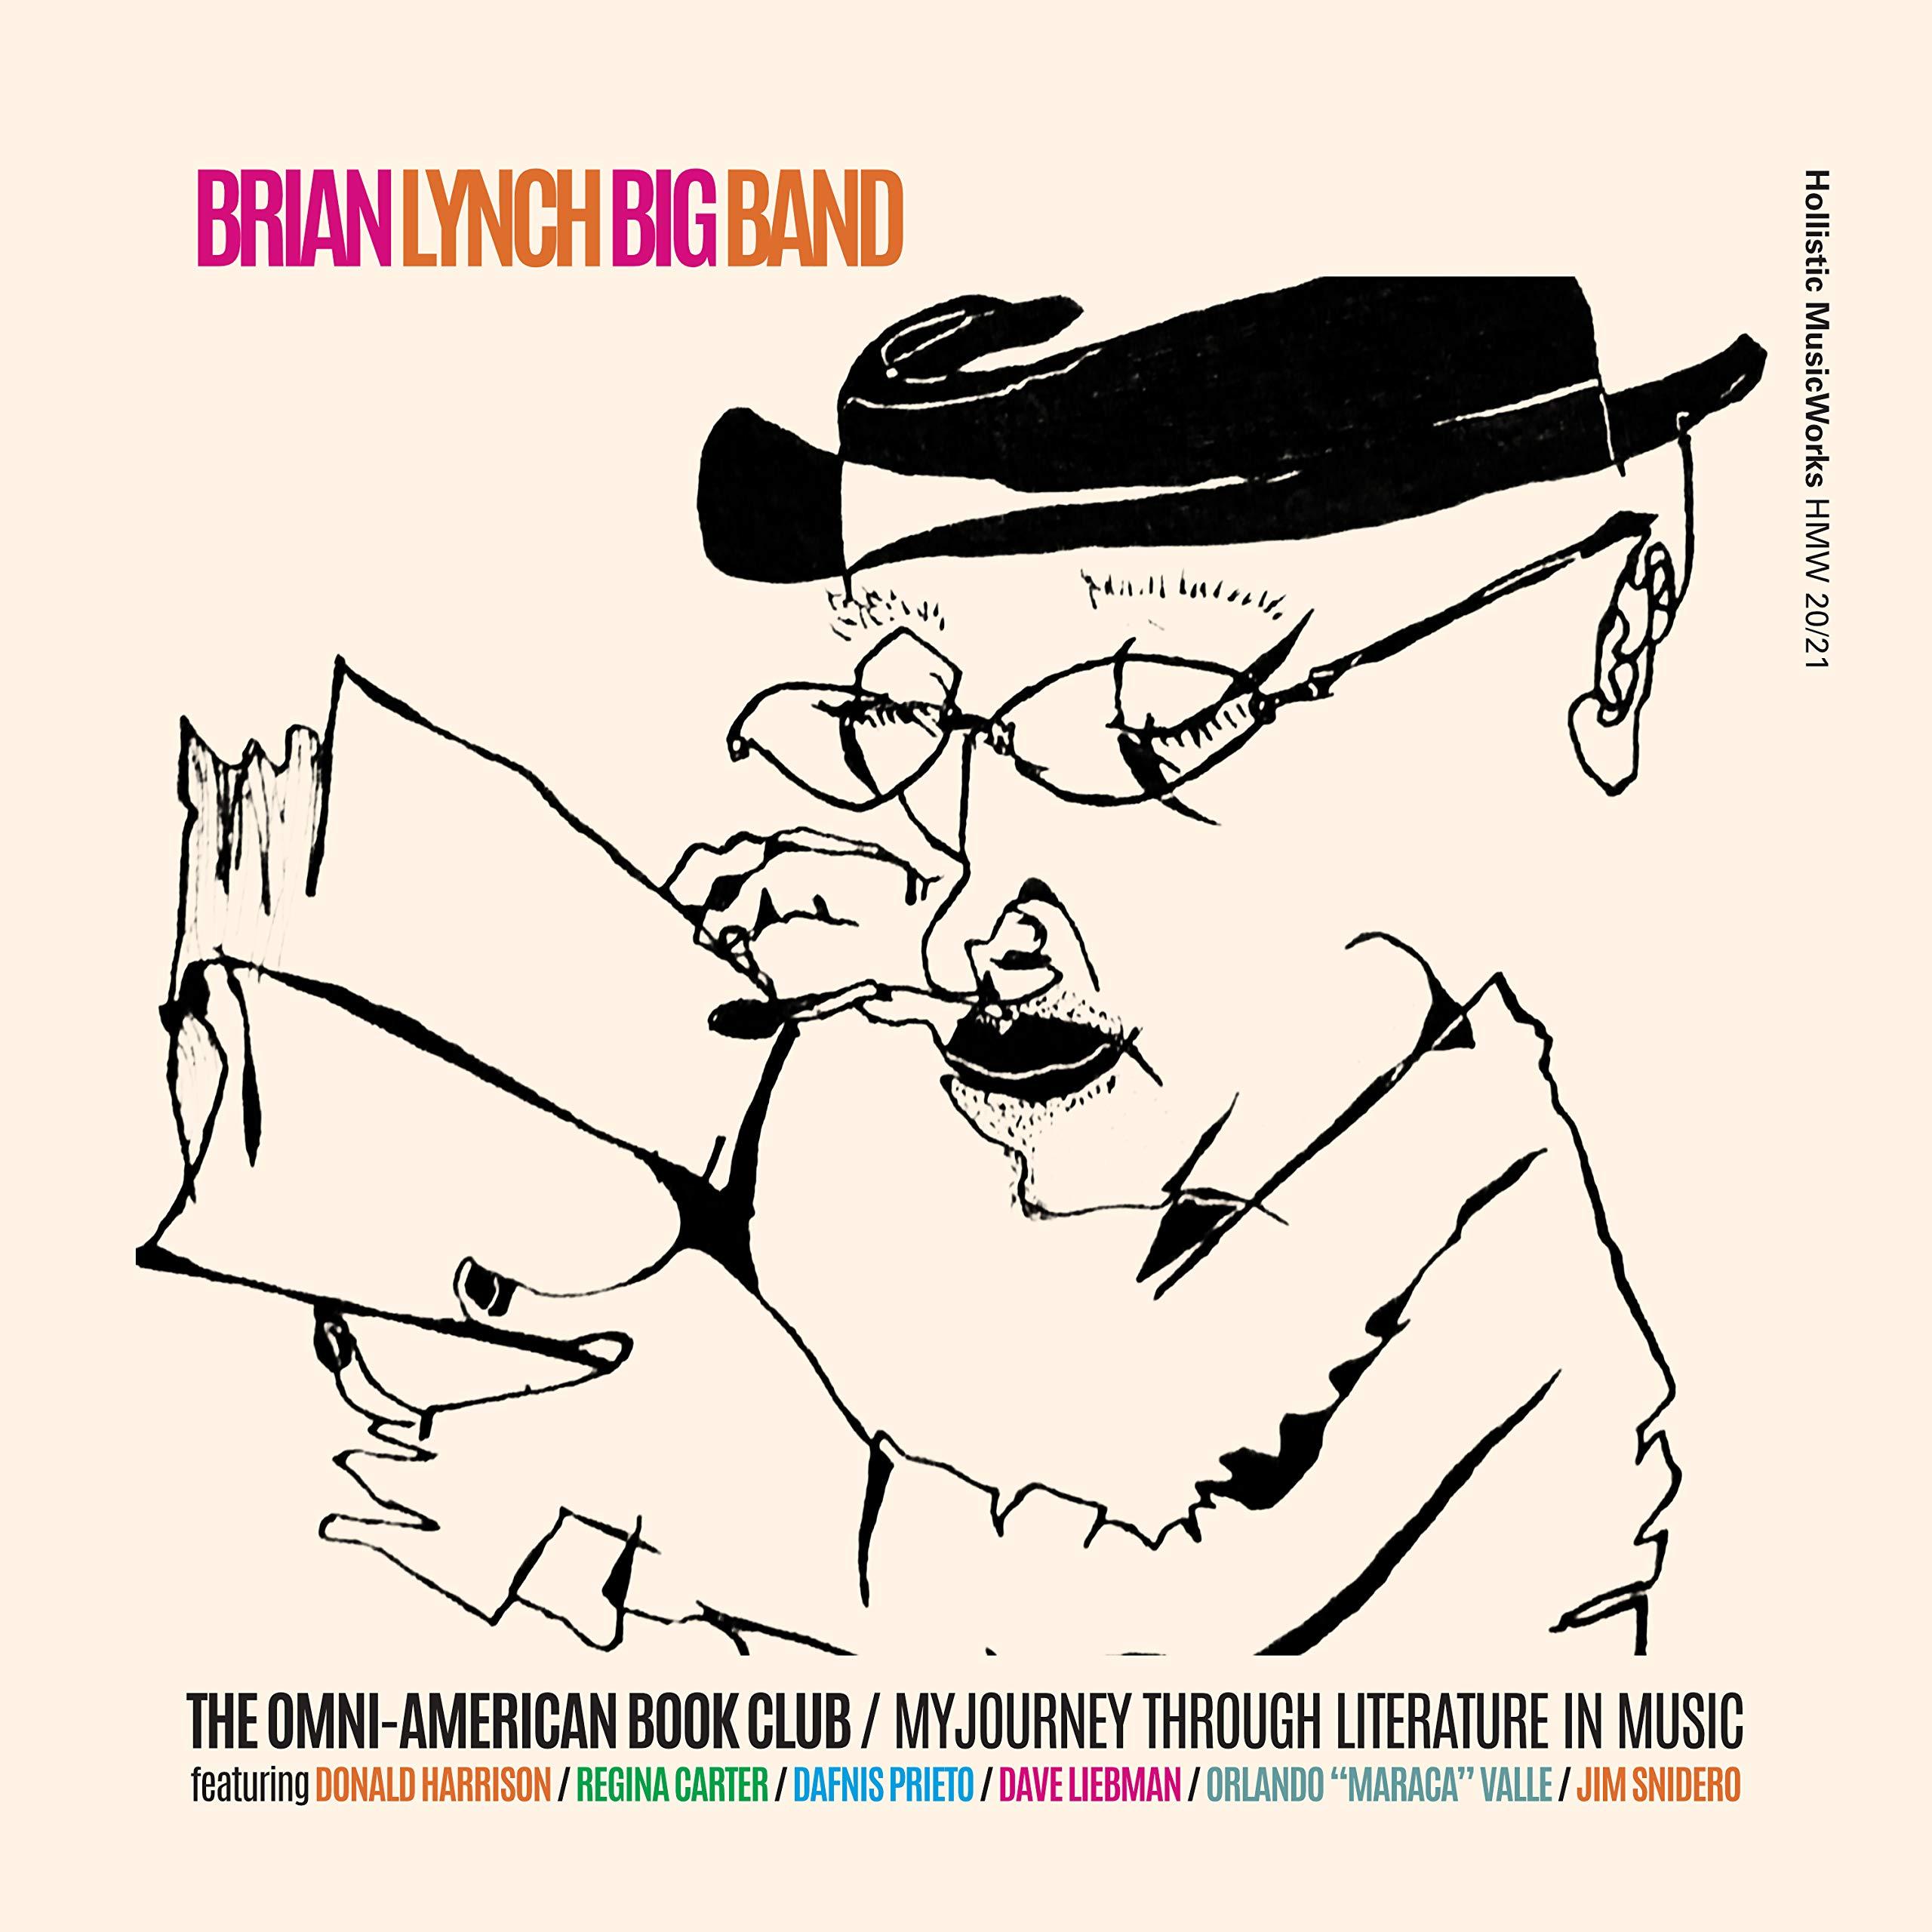 The Omni-American Book Club: My Journey Through Literature In Music